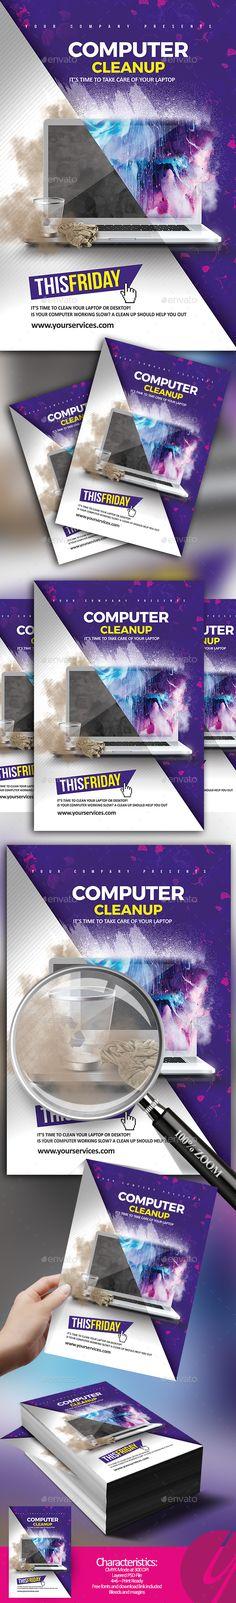 Computer Clean Services - Miscellaneous Events